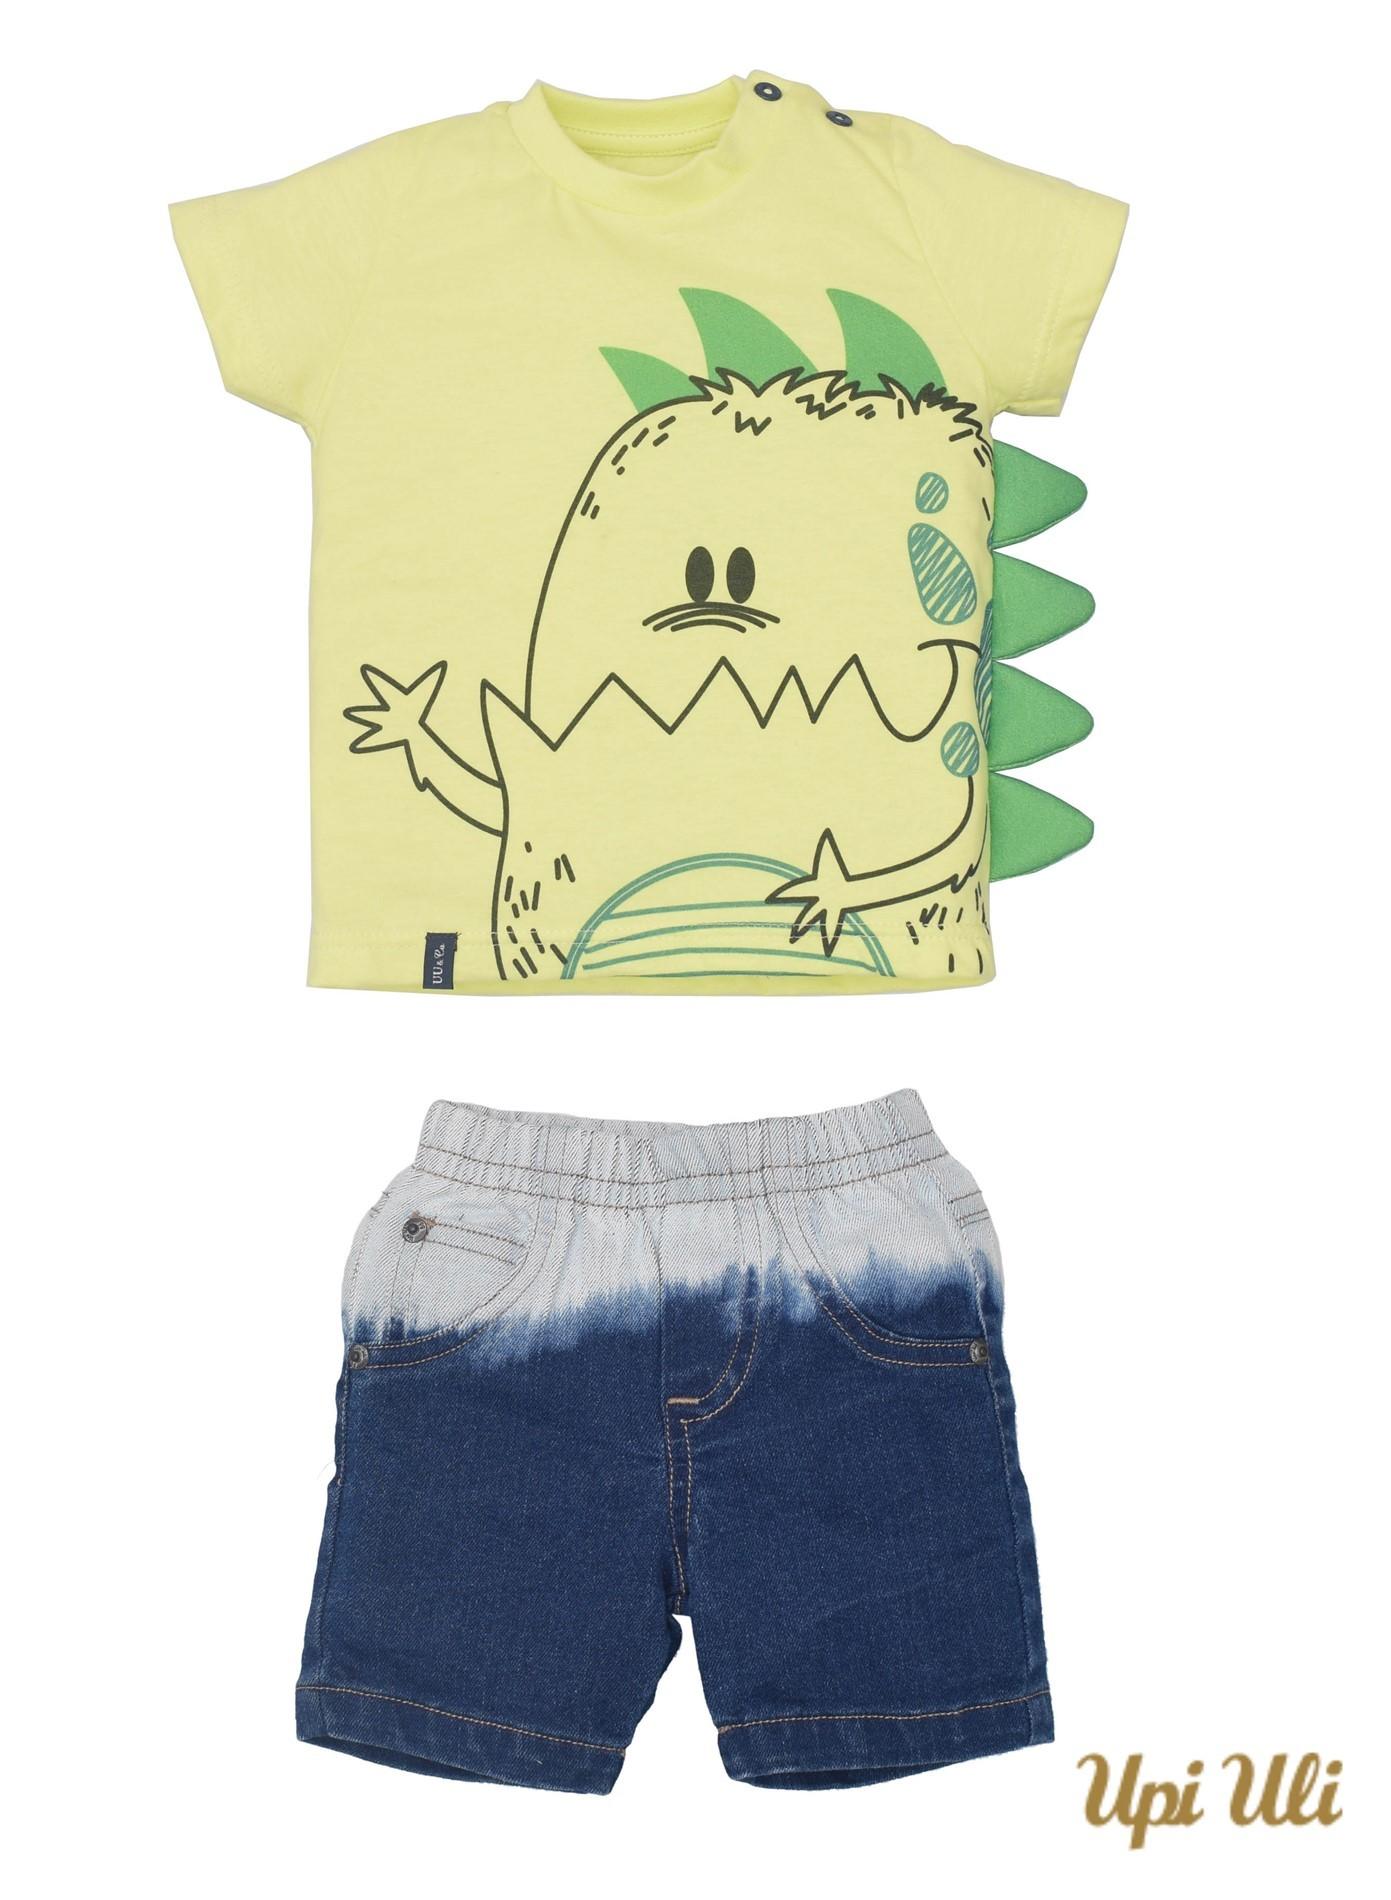 Conj. T-Shirt Meia Malha/Jeans Leonardo